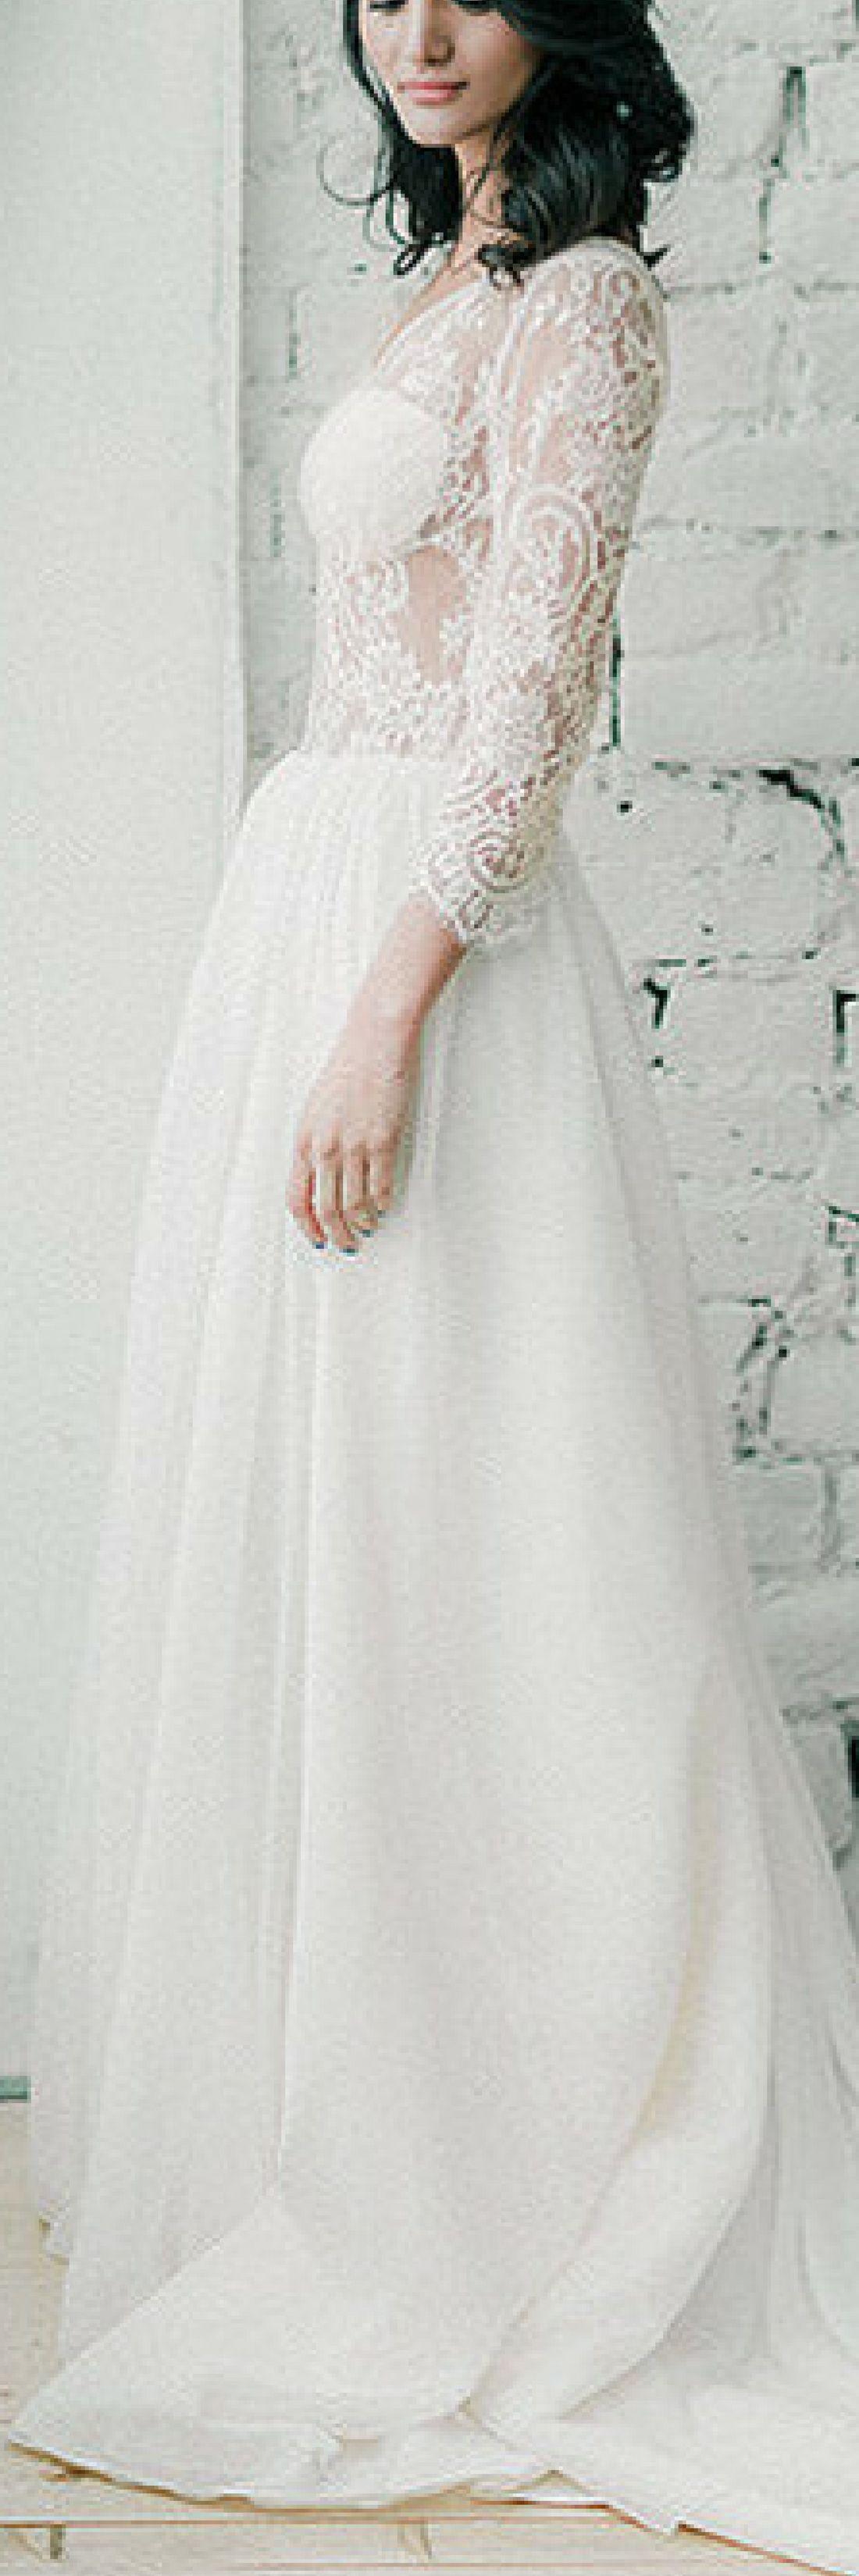 Tasmin  Long sleeve wedding dress  Bohemian wedding dress